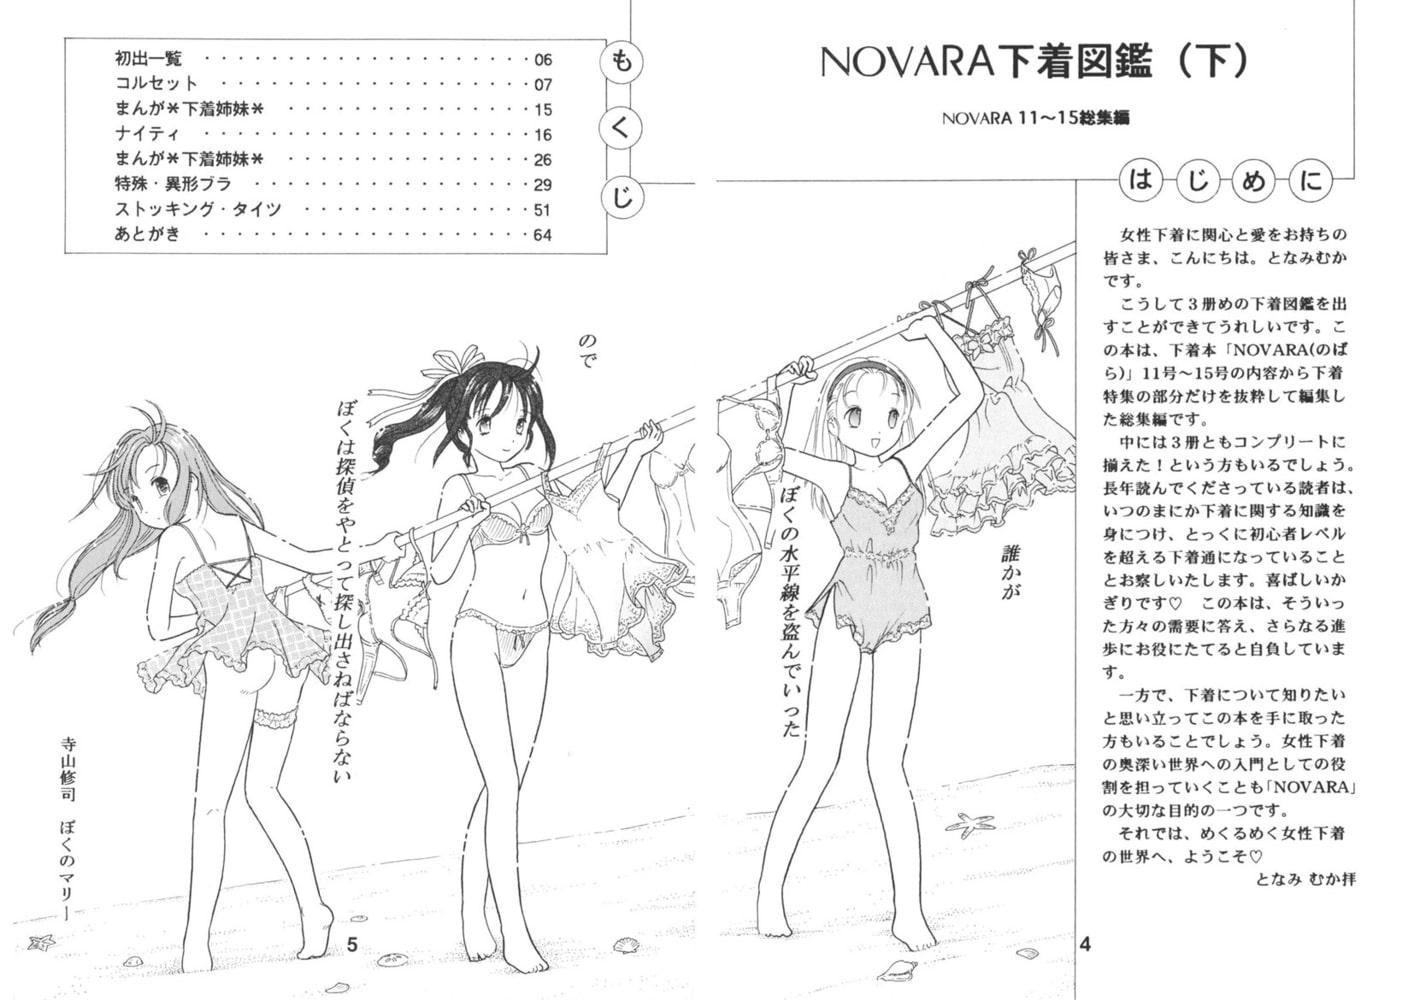 NOVARA下着図鑑(下)